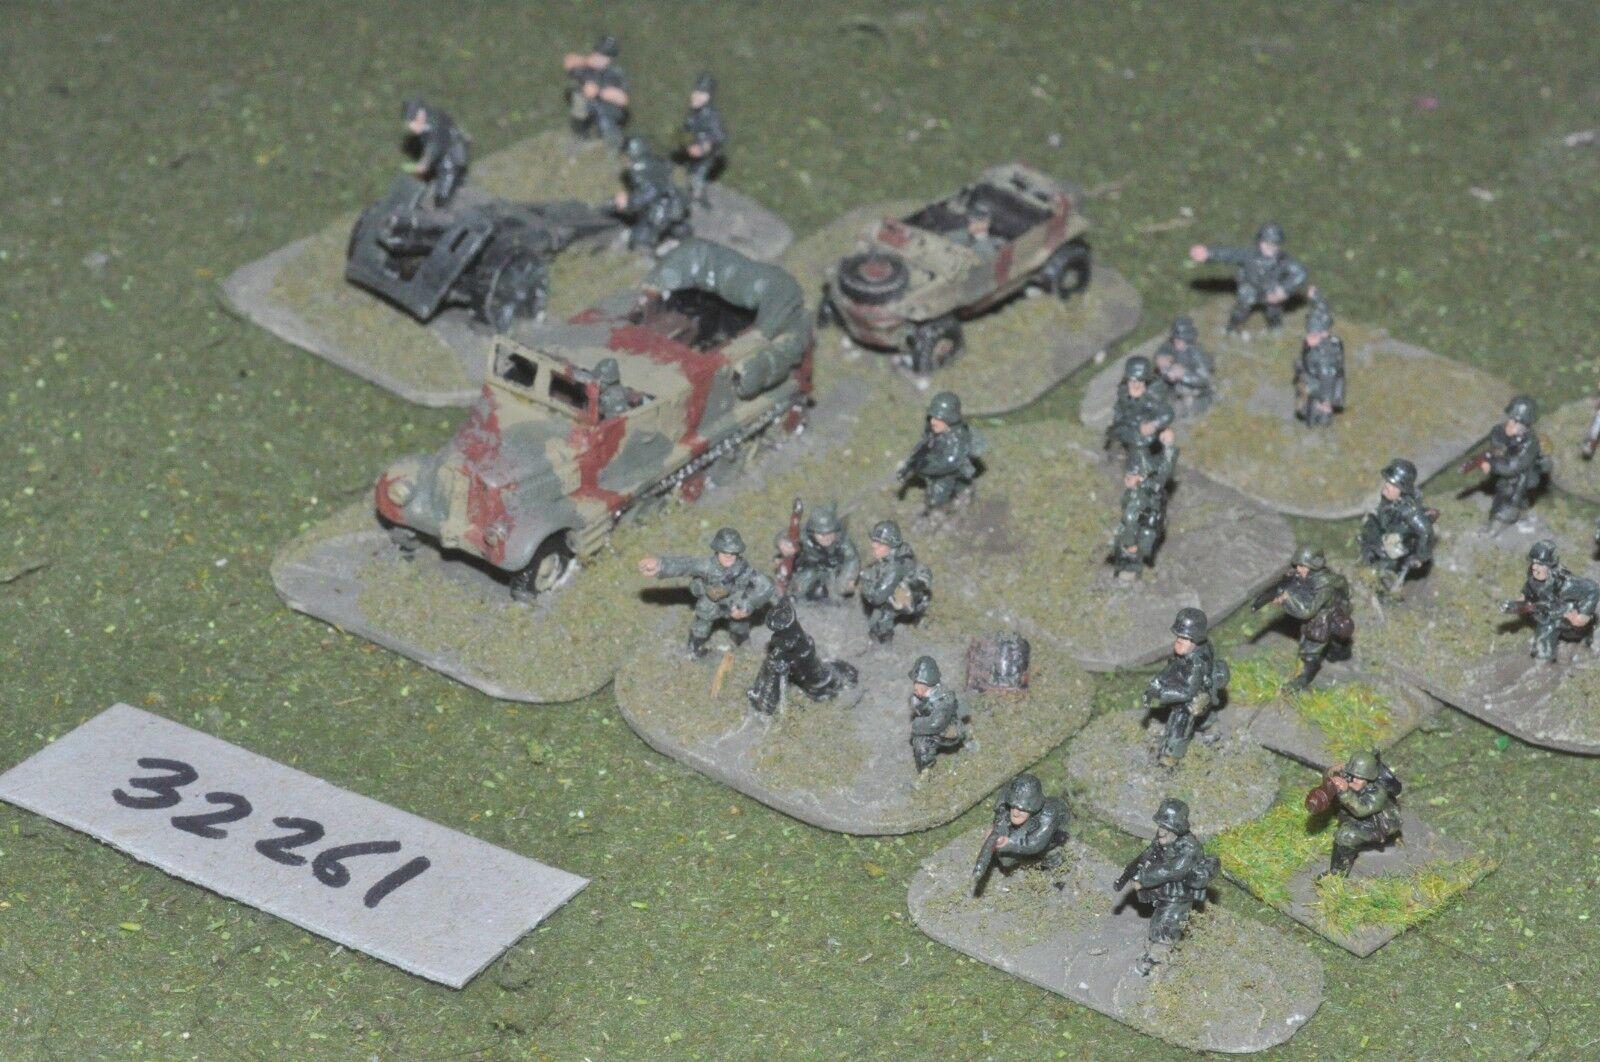 15mm Segunda Guerra Mundial grupo de batalla alemán (como la foto) - INF (32261)